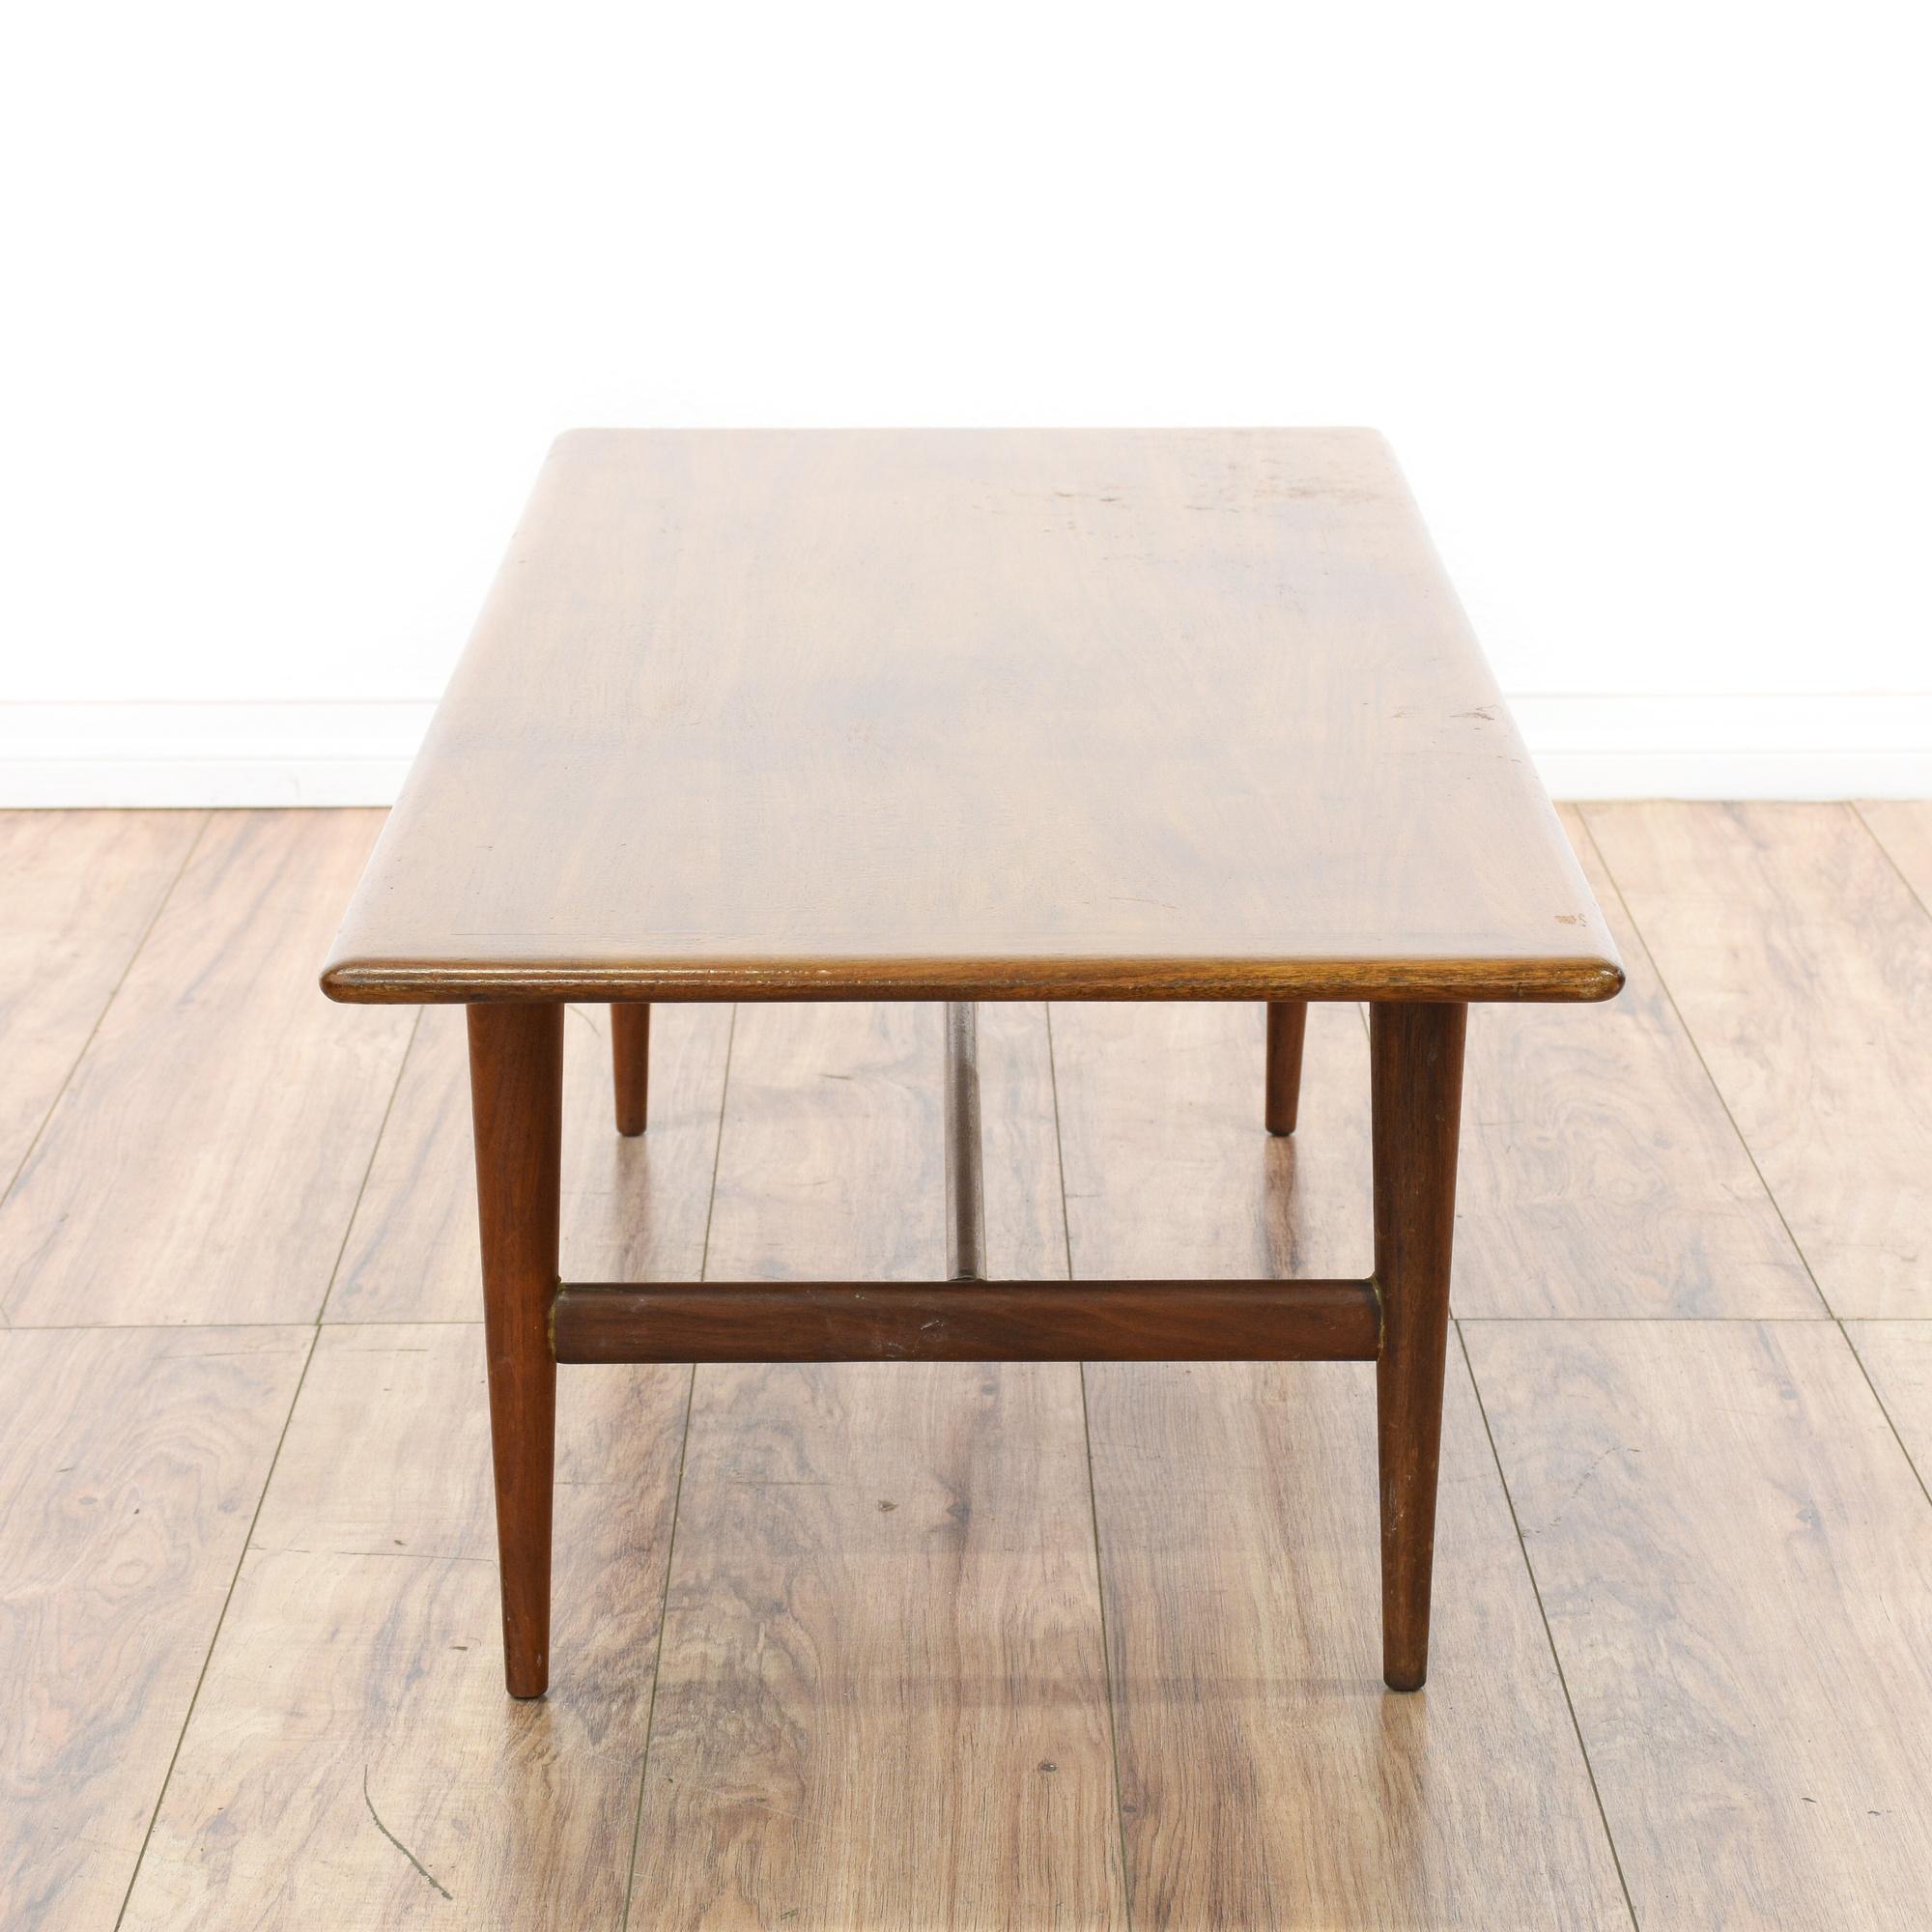 Mid Century Modern Rectangular Coffee Table